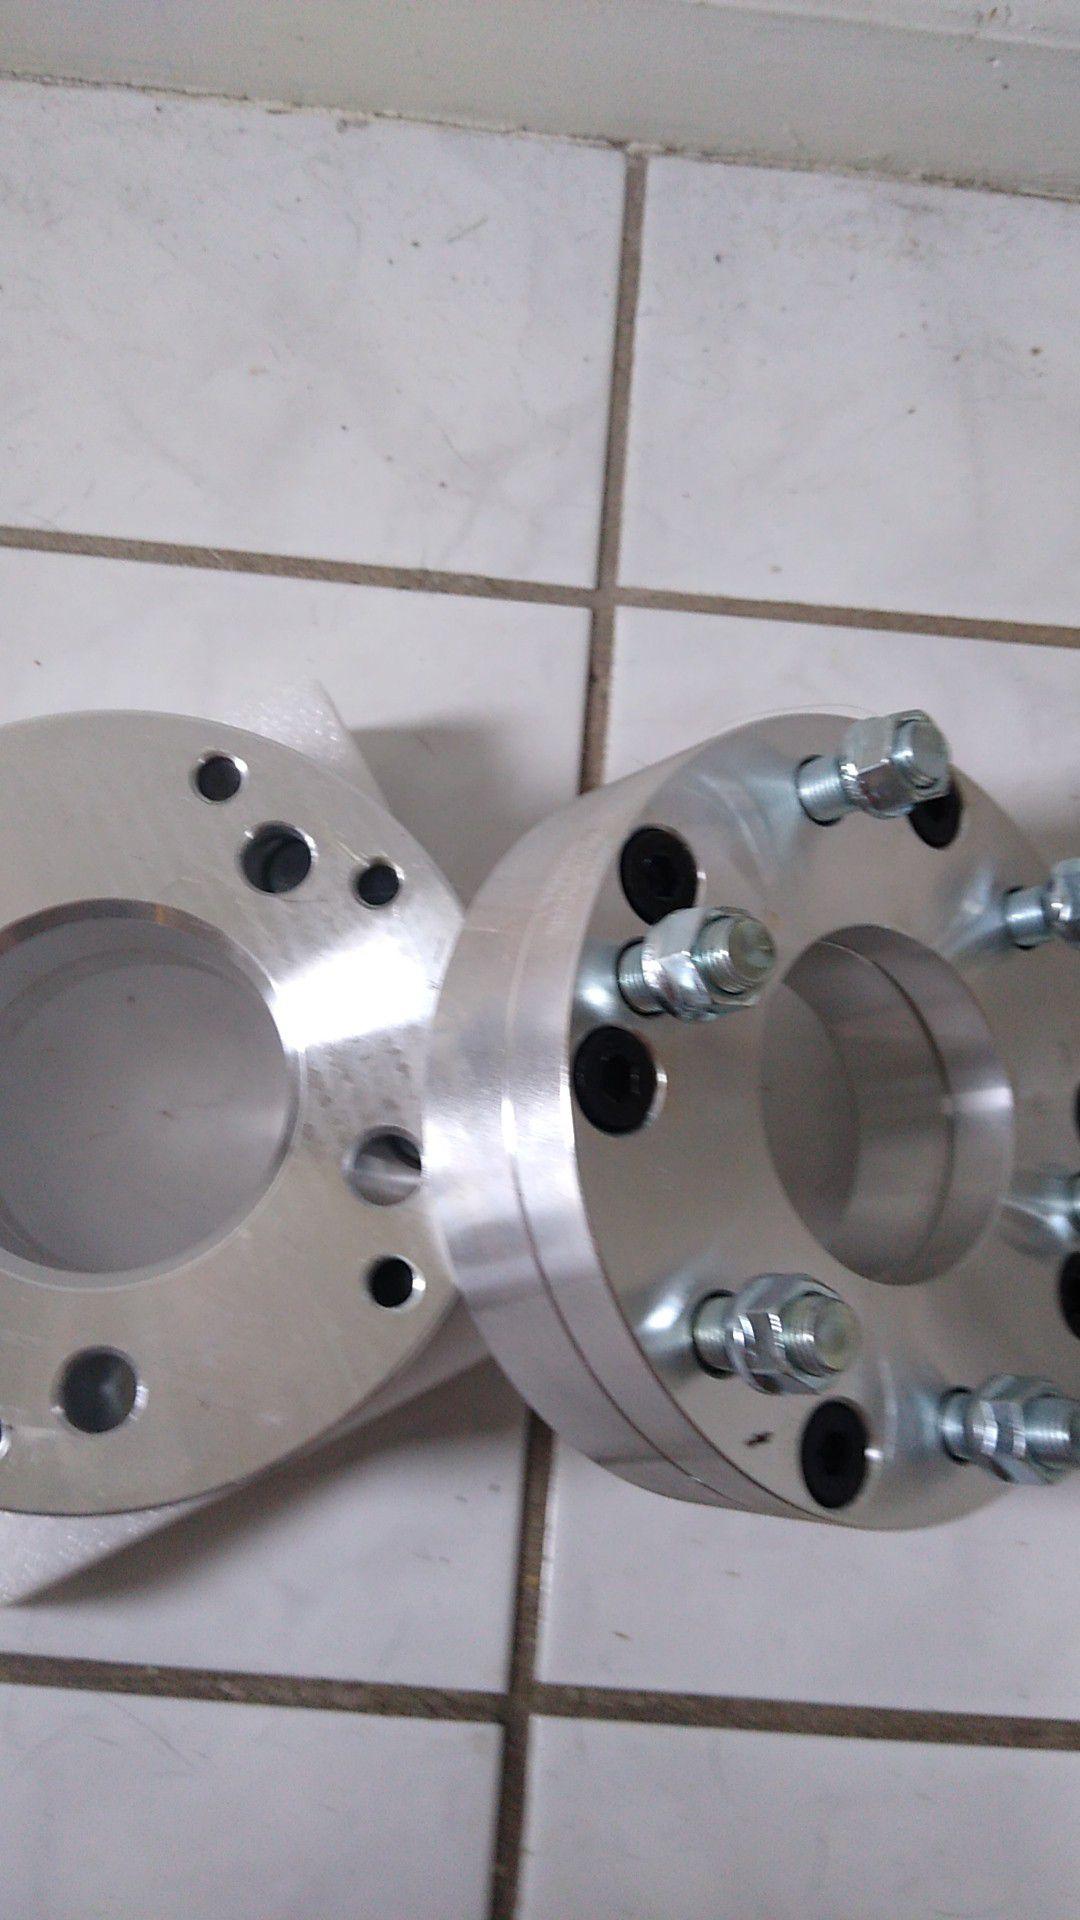 Chevy 6 lug to 5 lug wheel spacers adapters